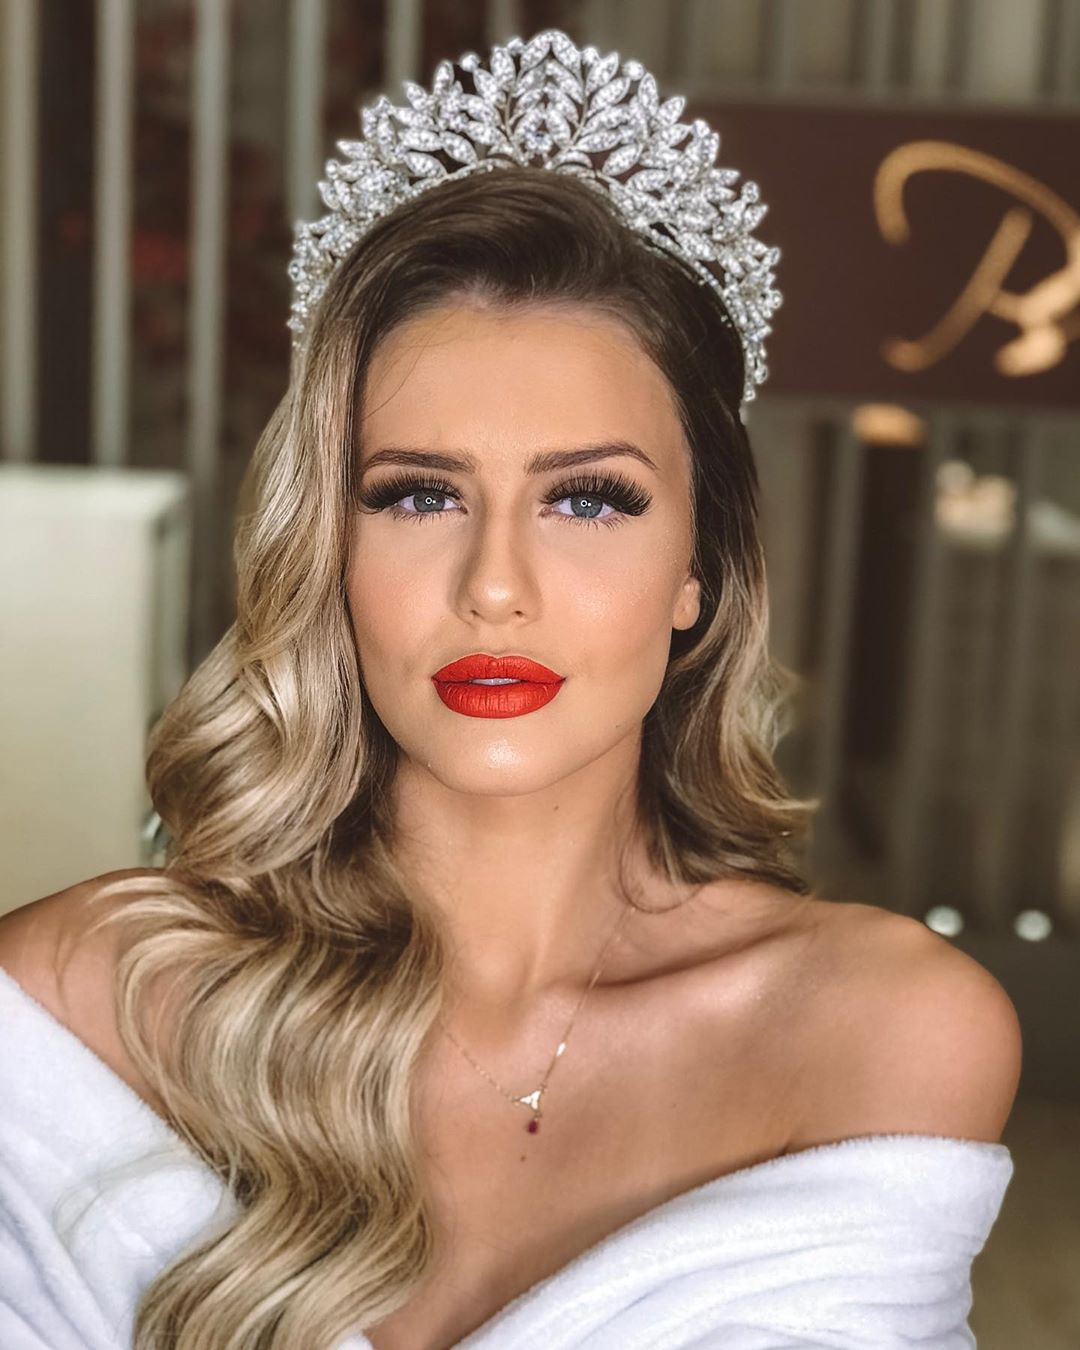 marcella kozinski de barros, miss curitiba 2020/3rd runner-up de miss tourism world 2019. - Página 2 60630310